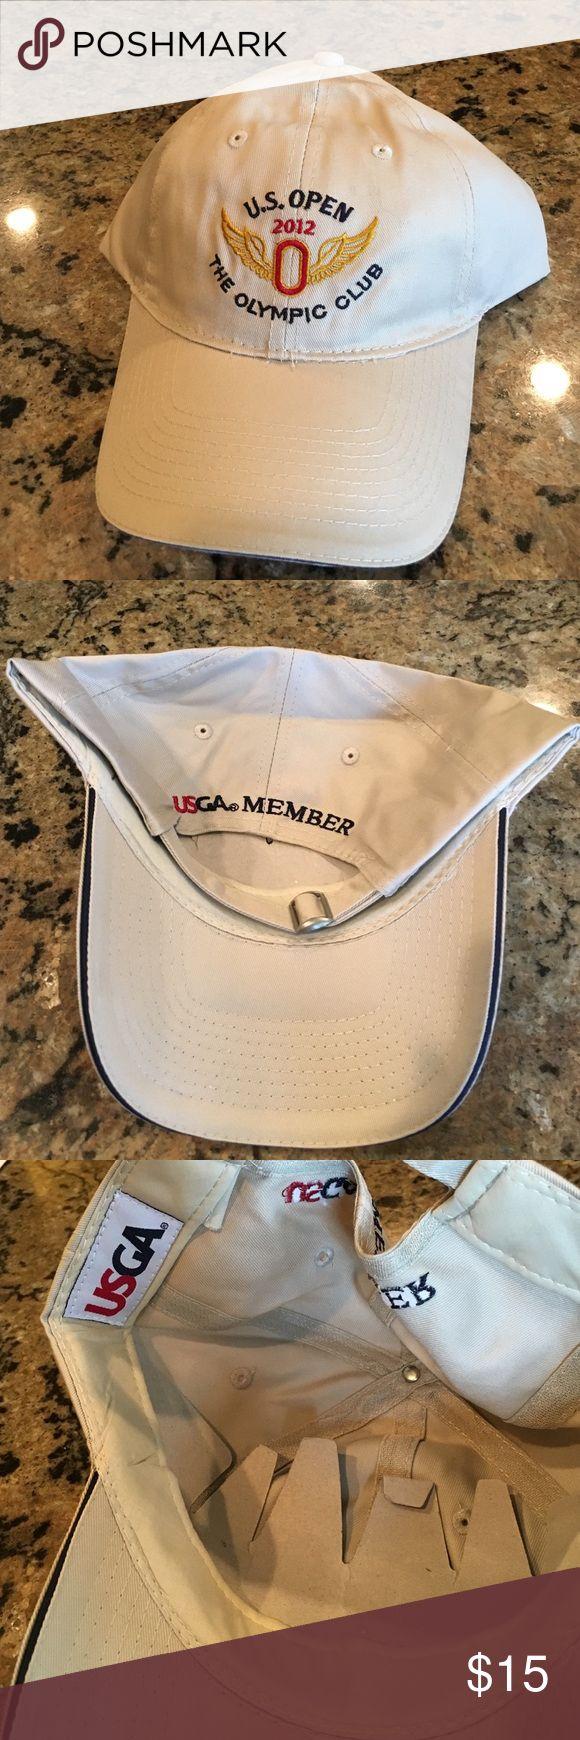 New USGA Cap U.S. Open The Olympic Club New USGA Cap U.S. Open The Olympic Club Accessories Hats